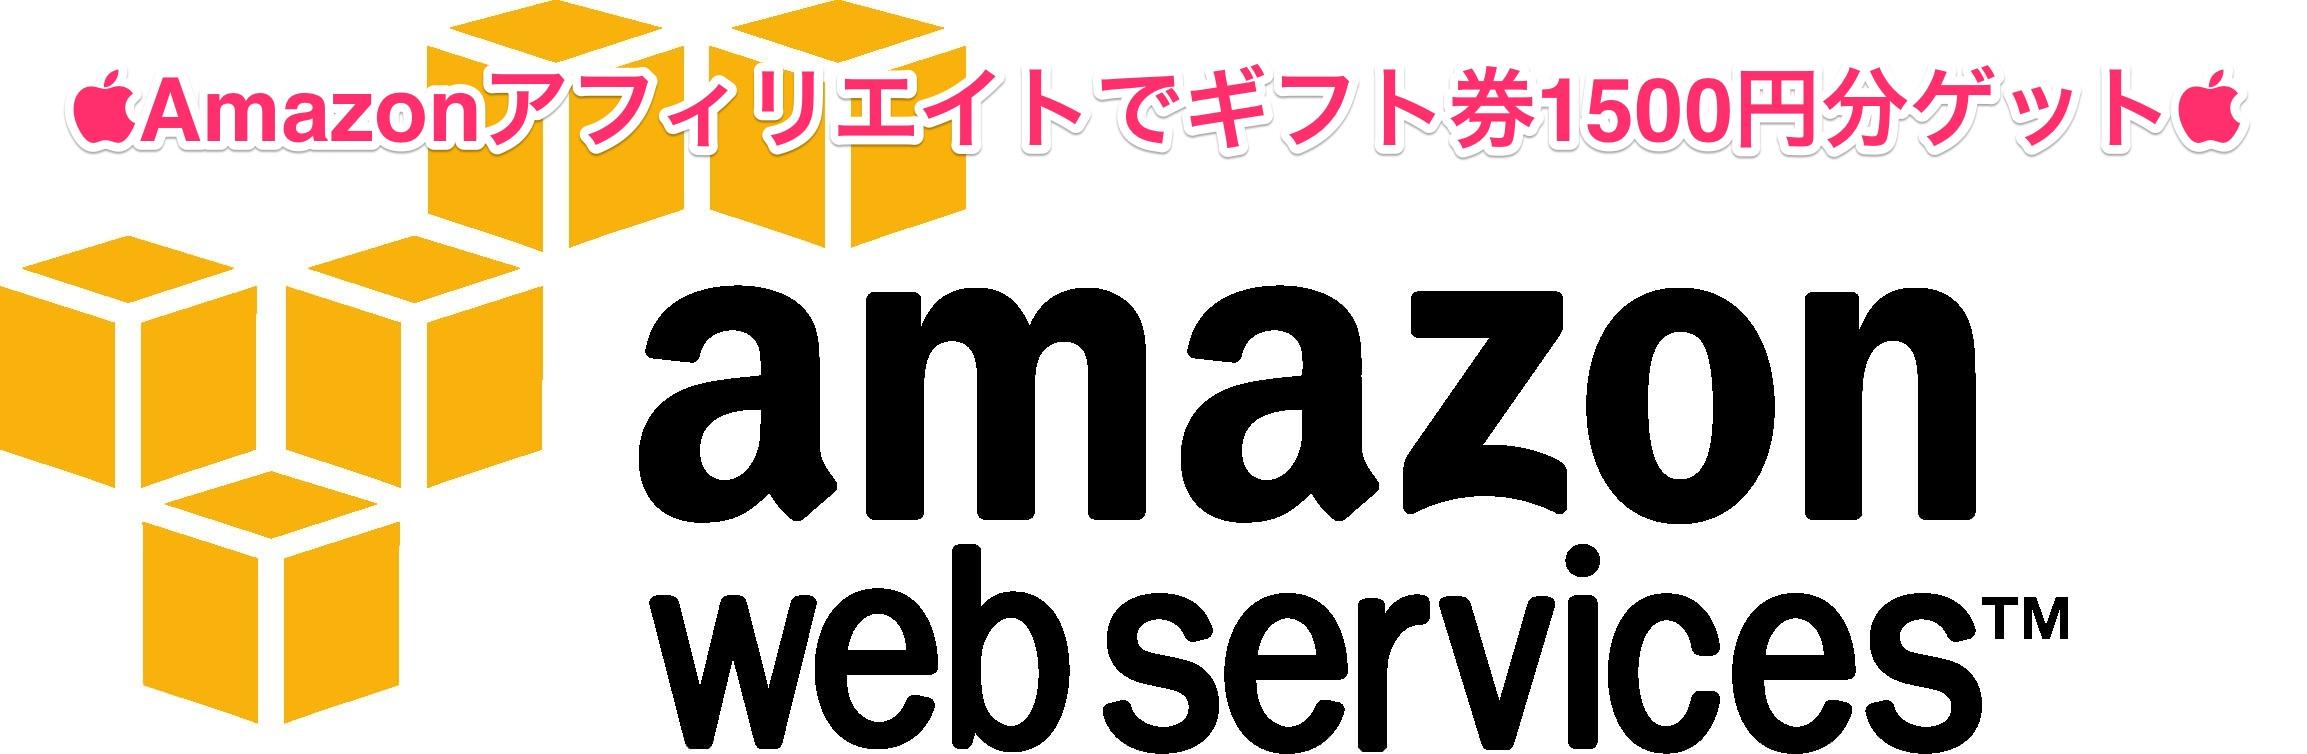 Amazonアフィリエイトで1500円分の報酬(ギフト券)ゲット